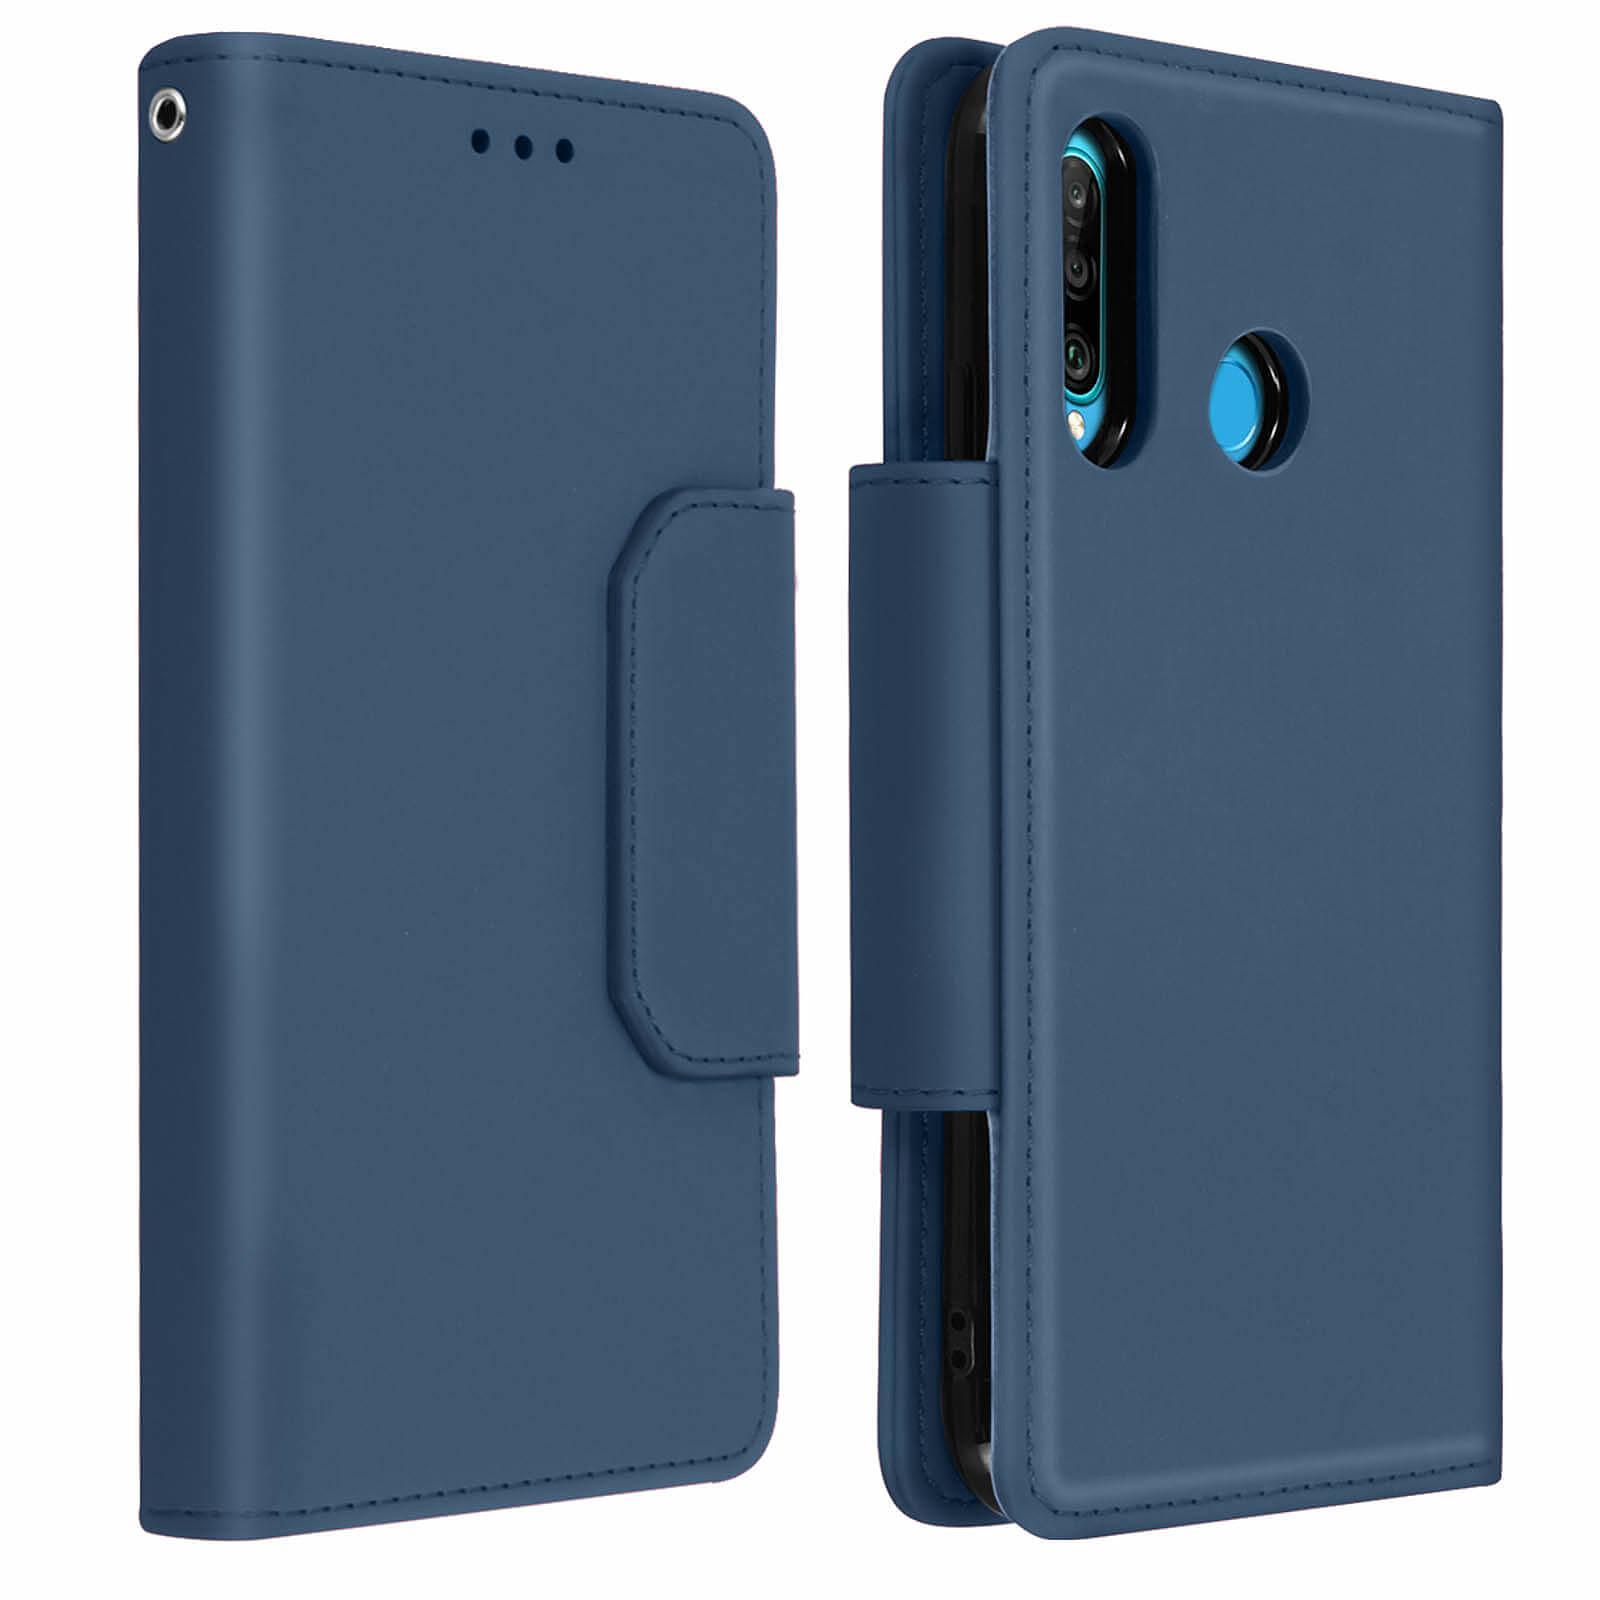 Avizar Etui folio Bleu Nuit pour Huawei P30 Lite , Honor 20S , Huawei P30 Lite XL